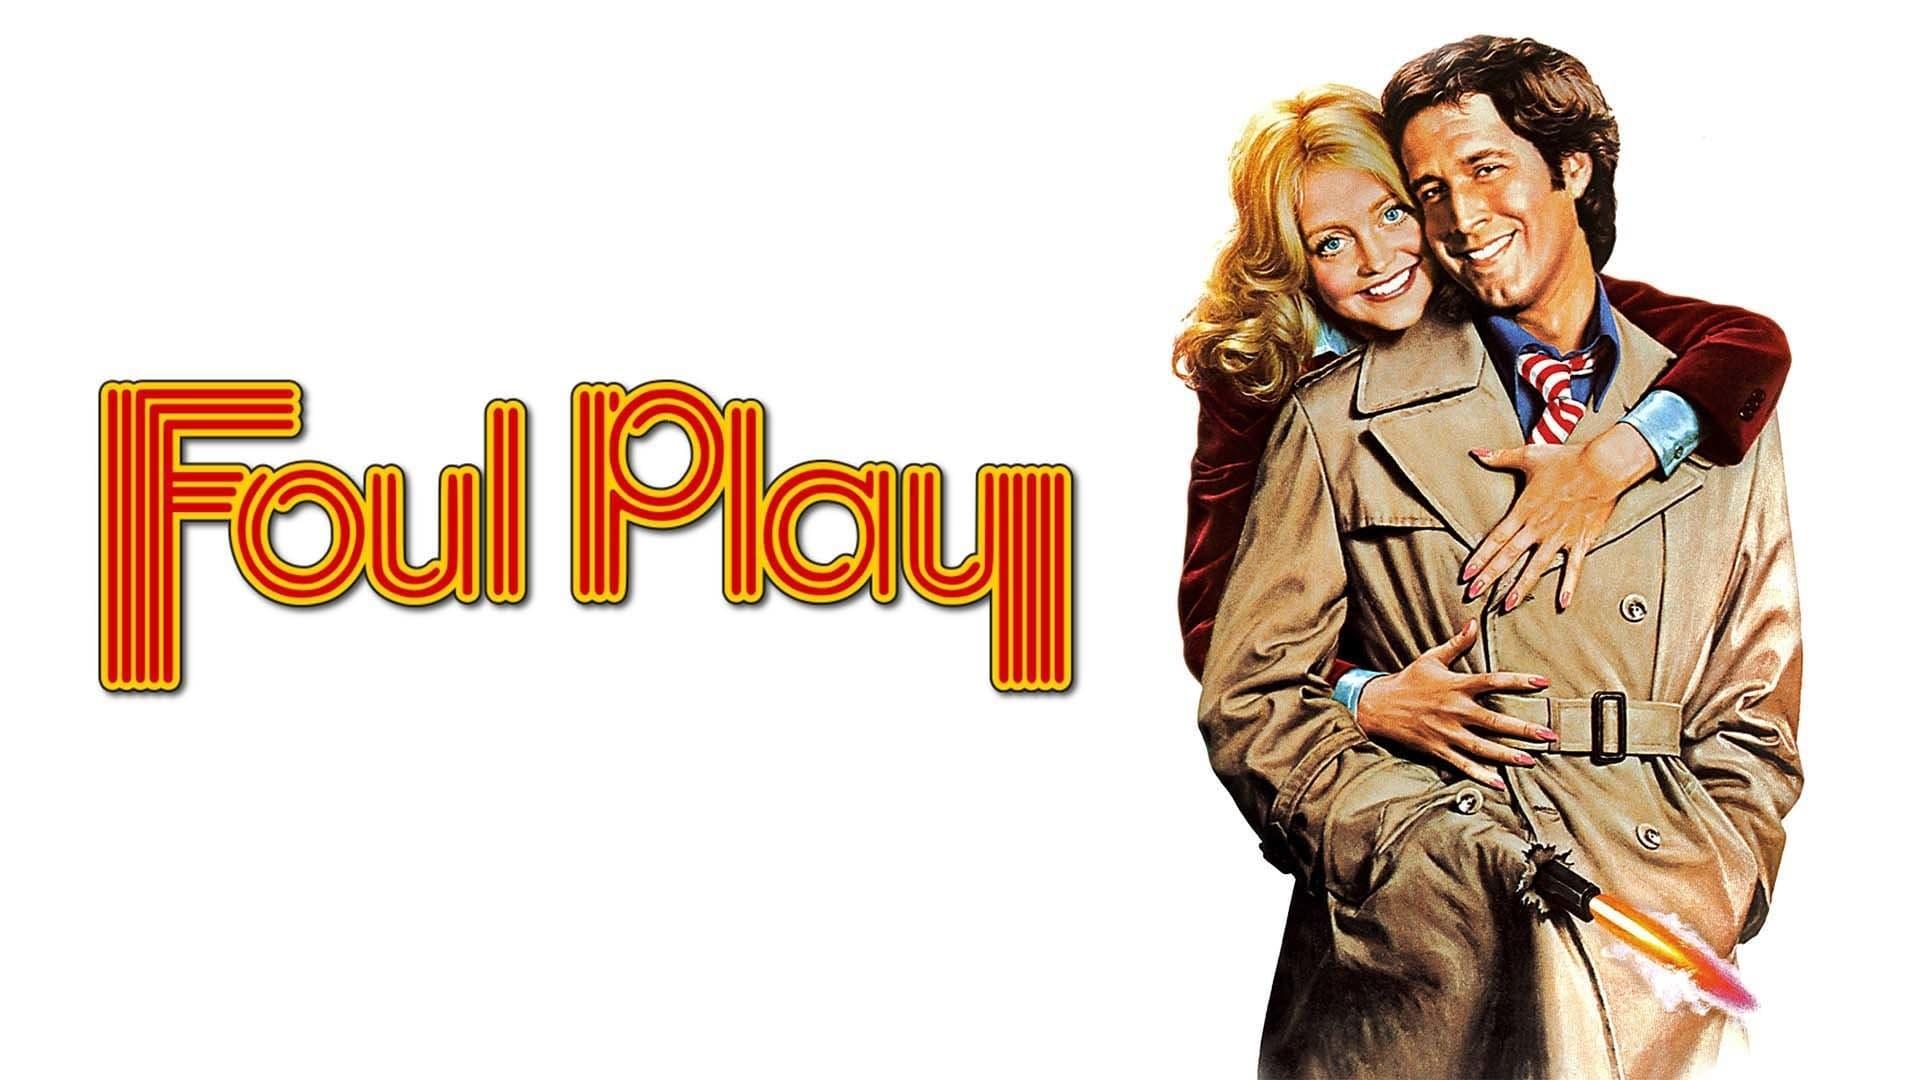 Foul movie play